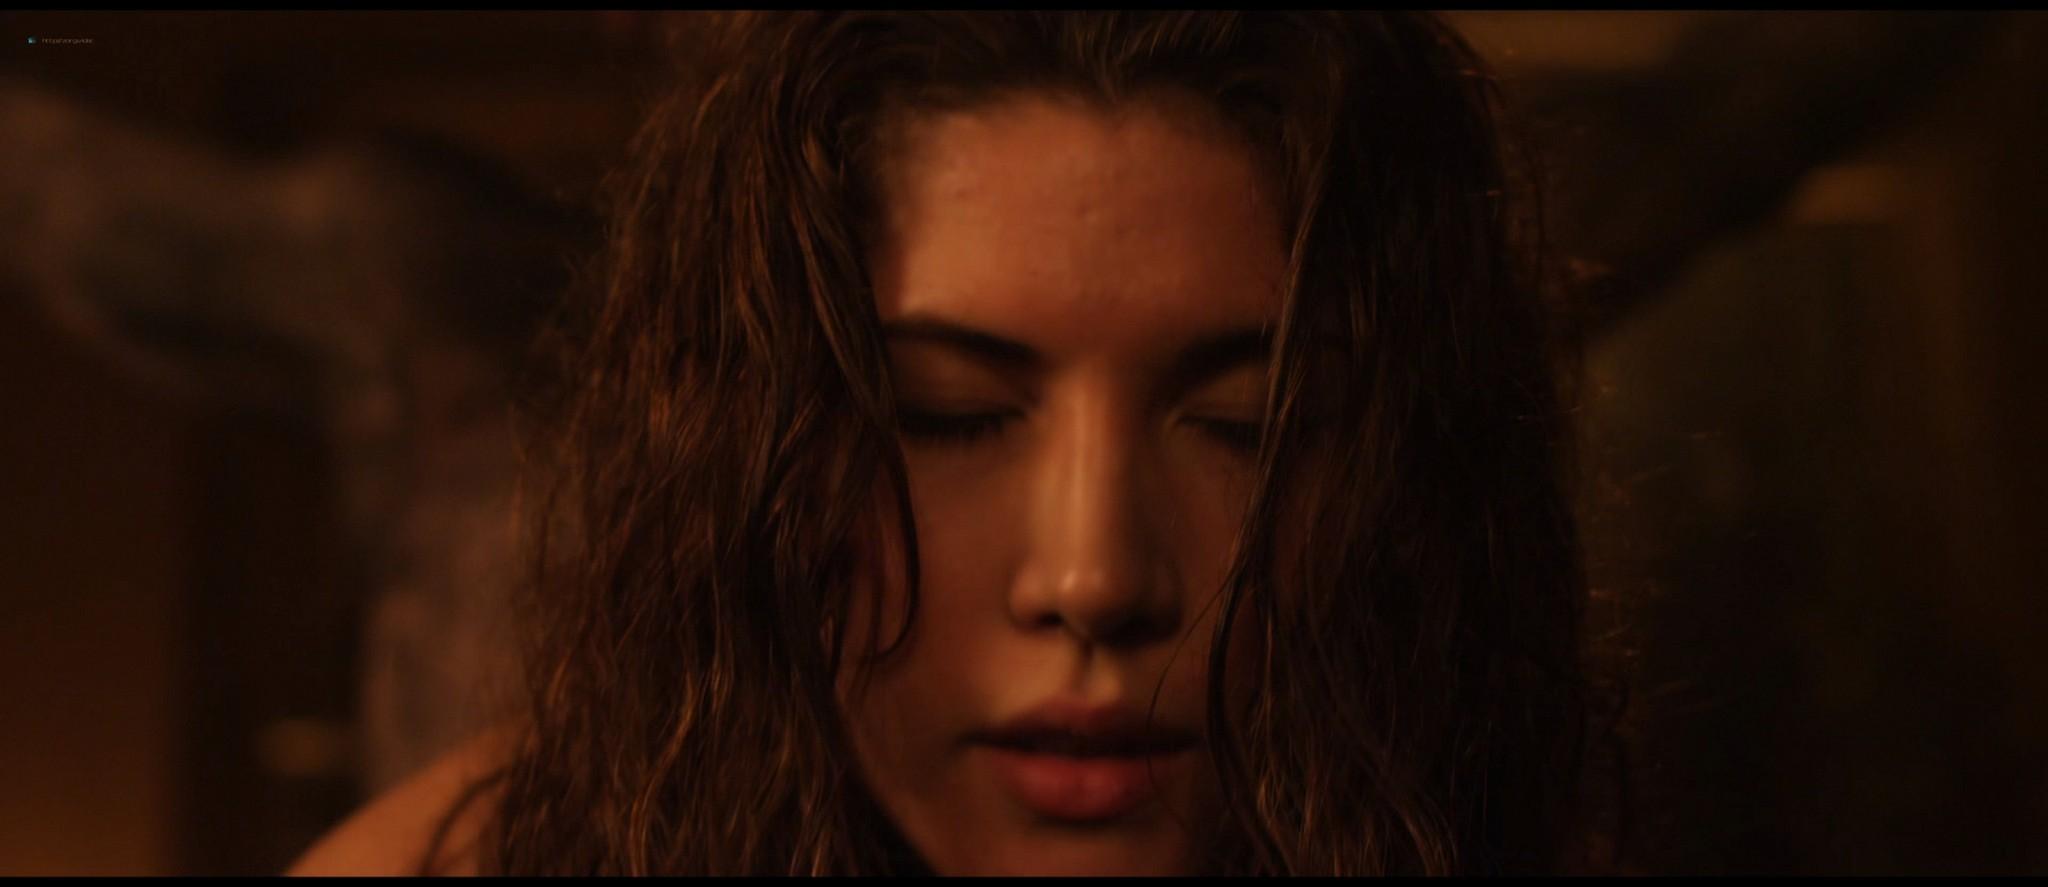 Elena Mirela nude Grazia Leone, Denny Méndez nude too - Blood Trap (2016) HD 1080p BluRay (7)